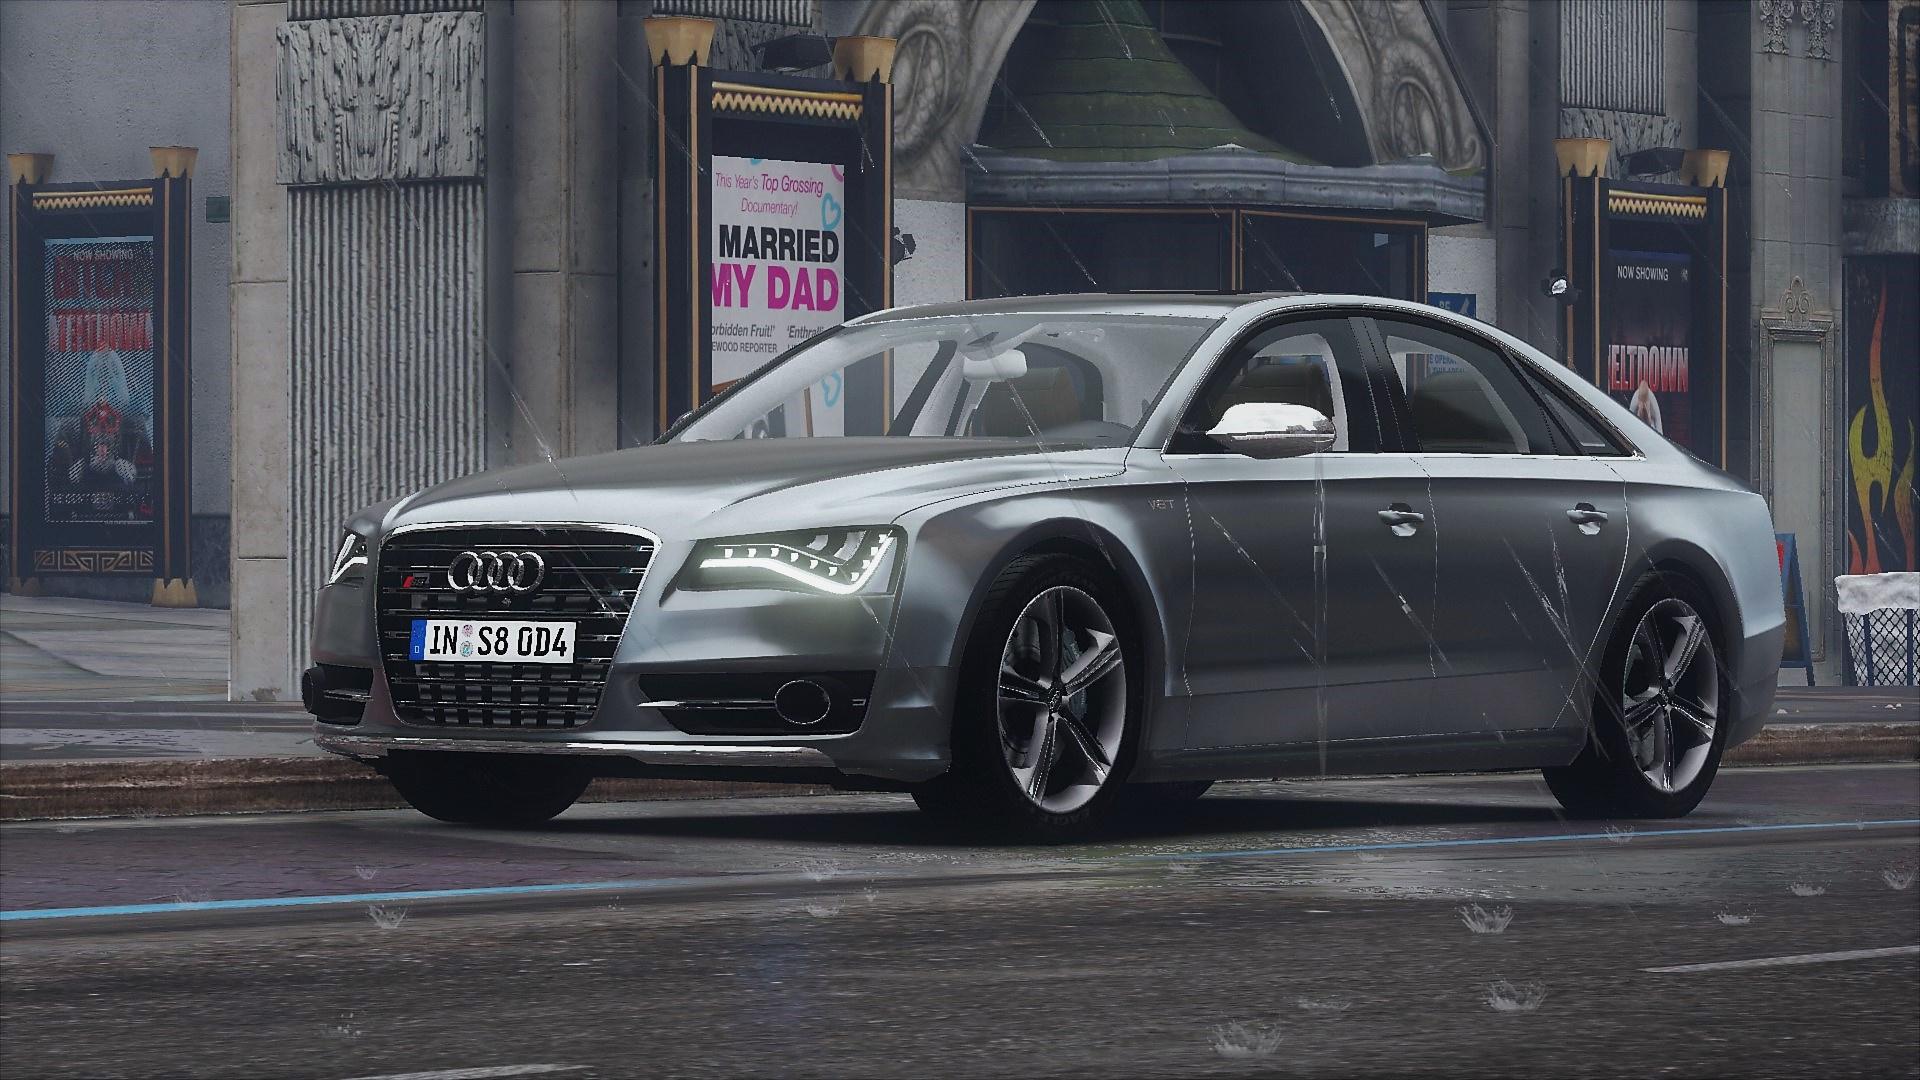 2013 Audi S8 (D4) Add-On  - GTA5-Mods.com